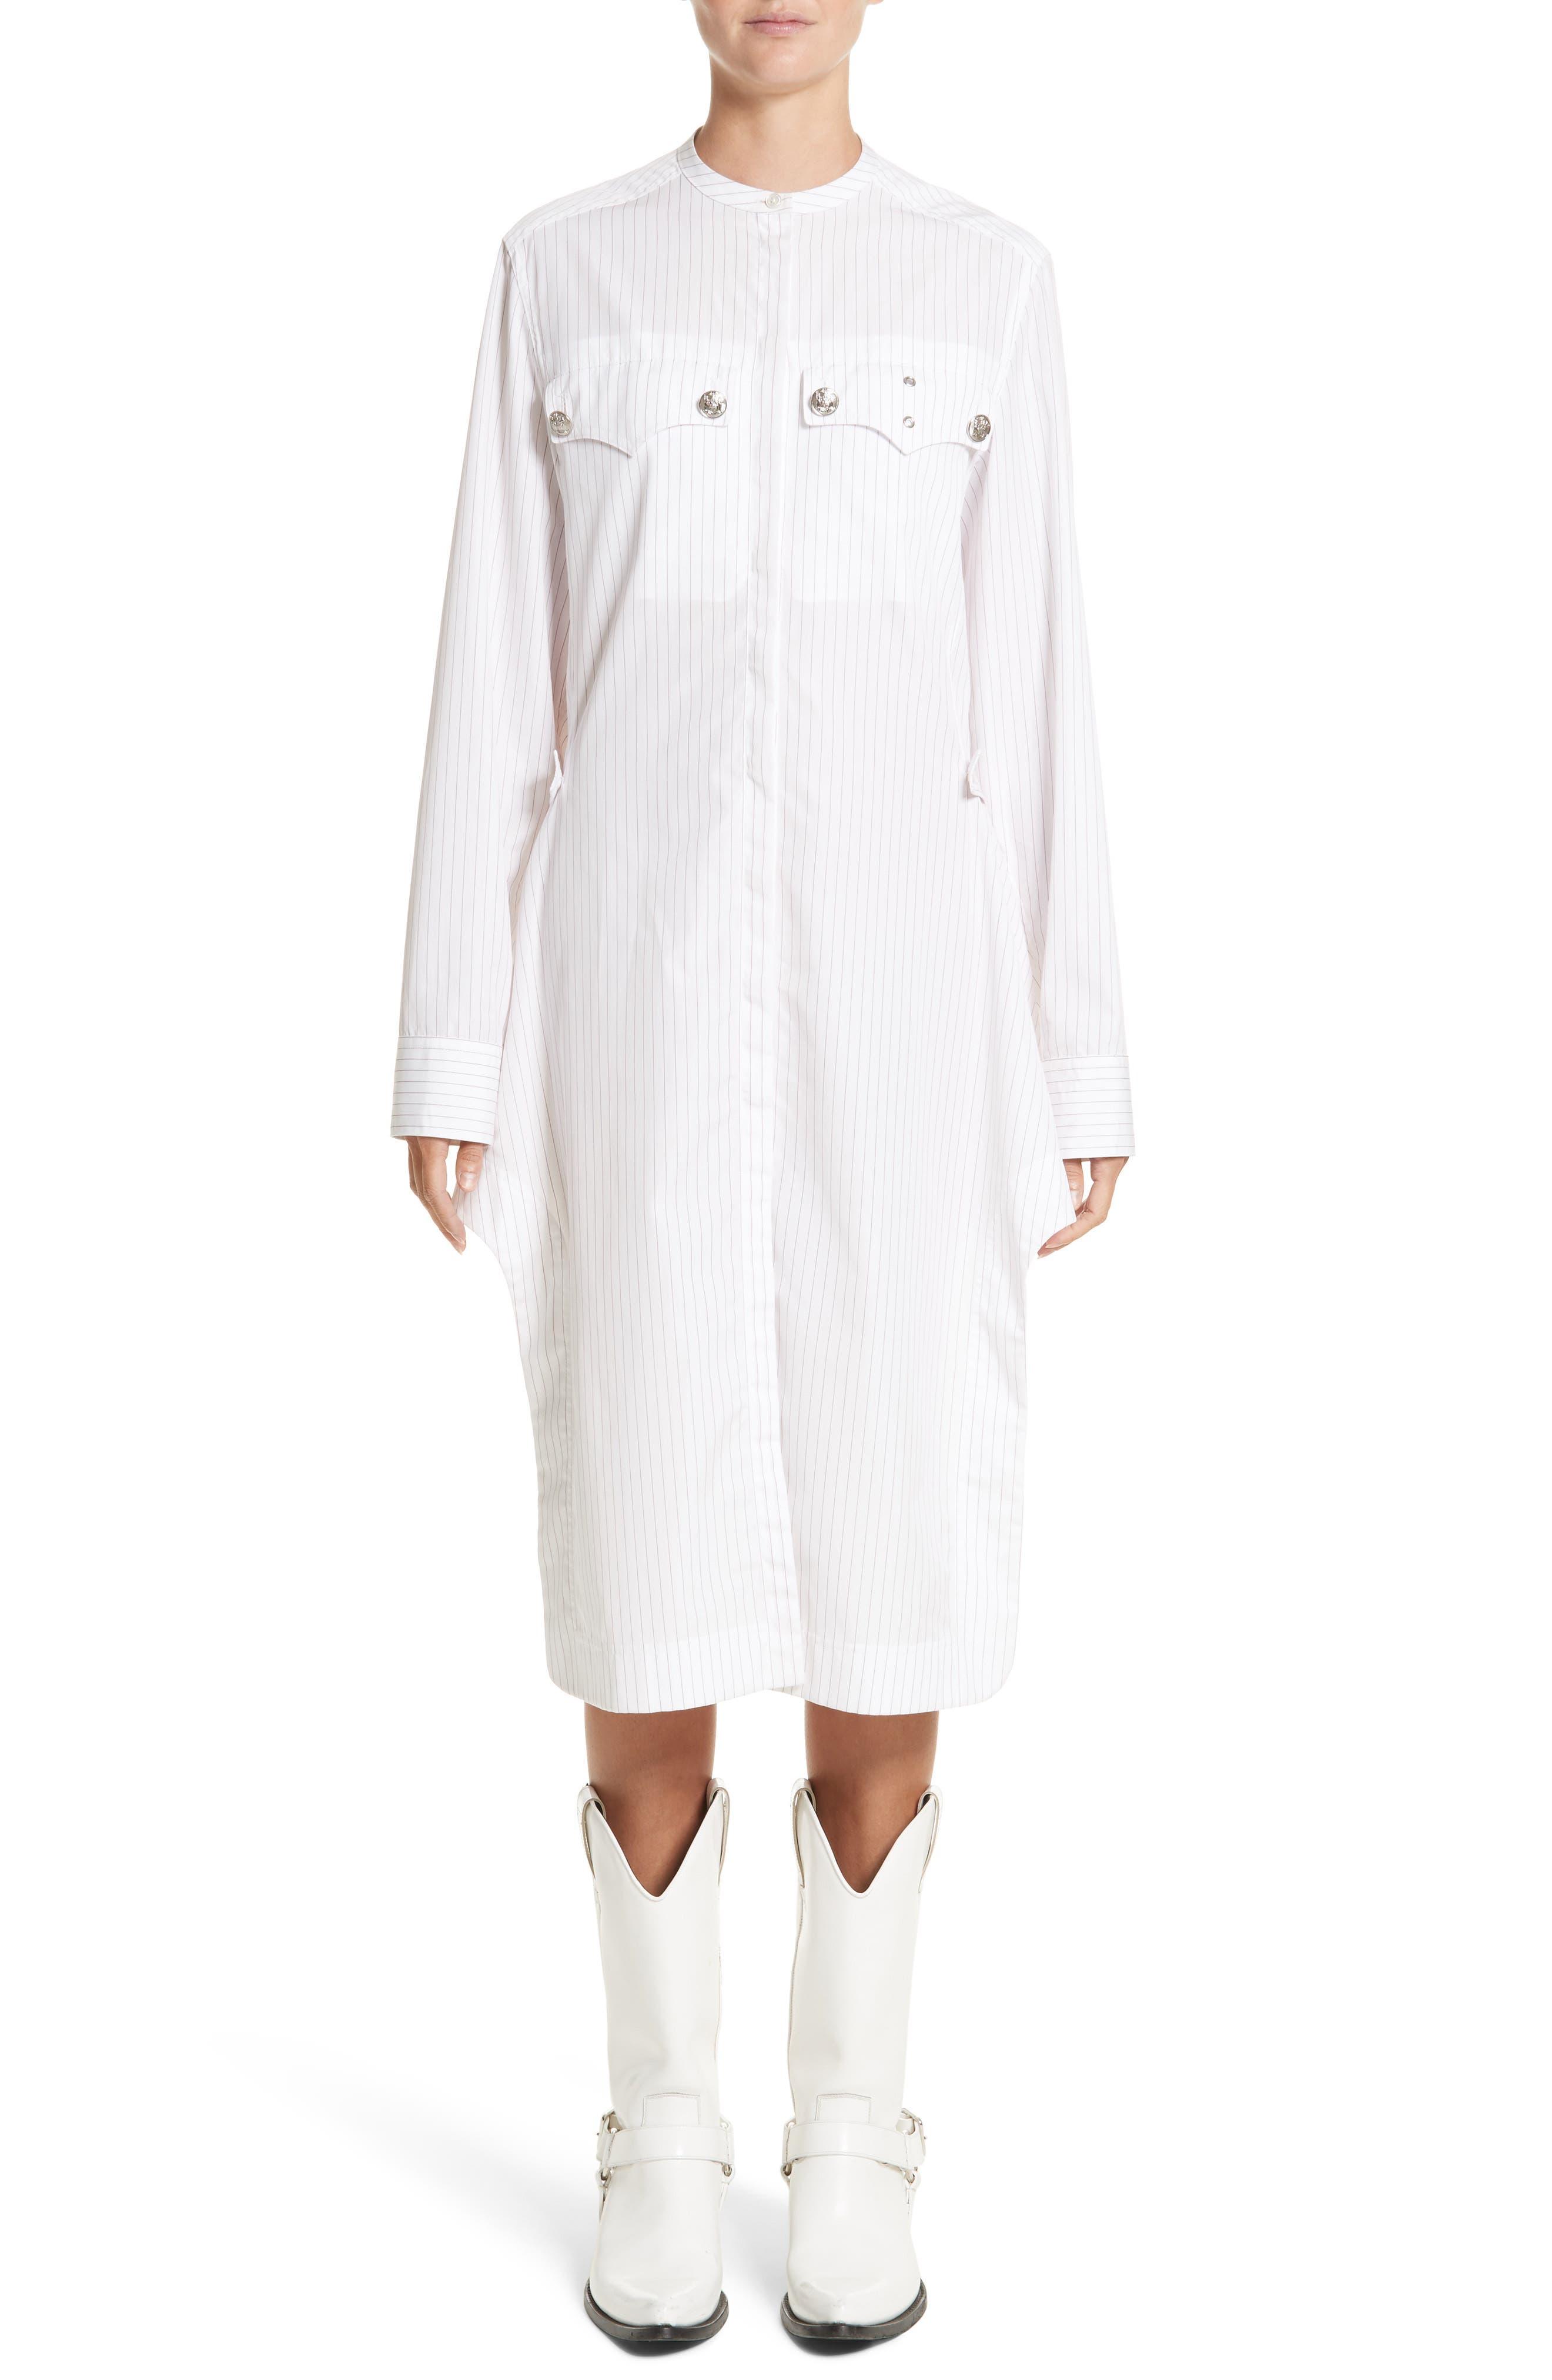 Alternate Image 1 Selected - Calvin Klein 205W39NYC Pinstripe Cotton Poplin Dress